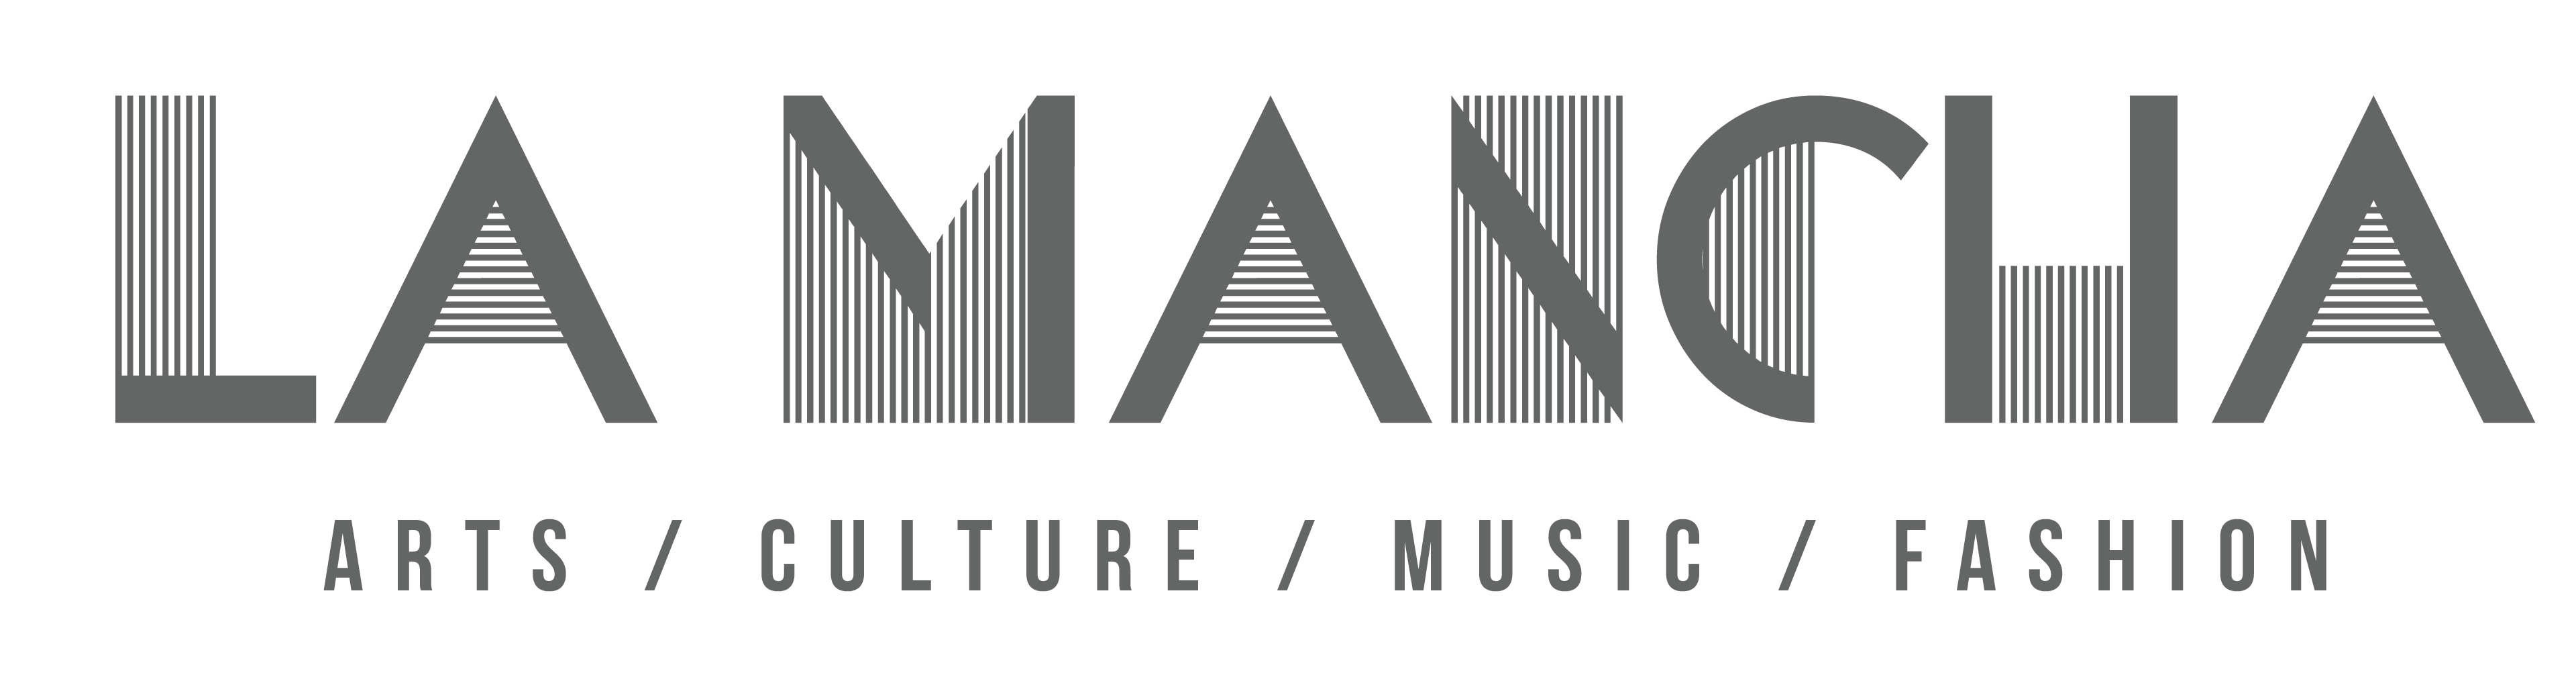 Arts Pavilion 2018 Press Release LaManchaLogo2018